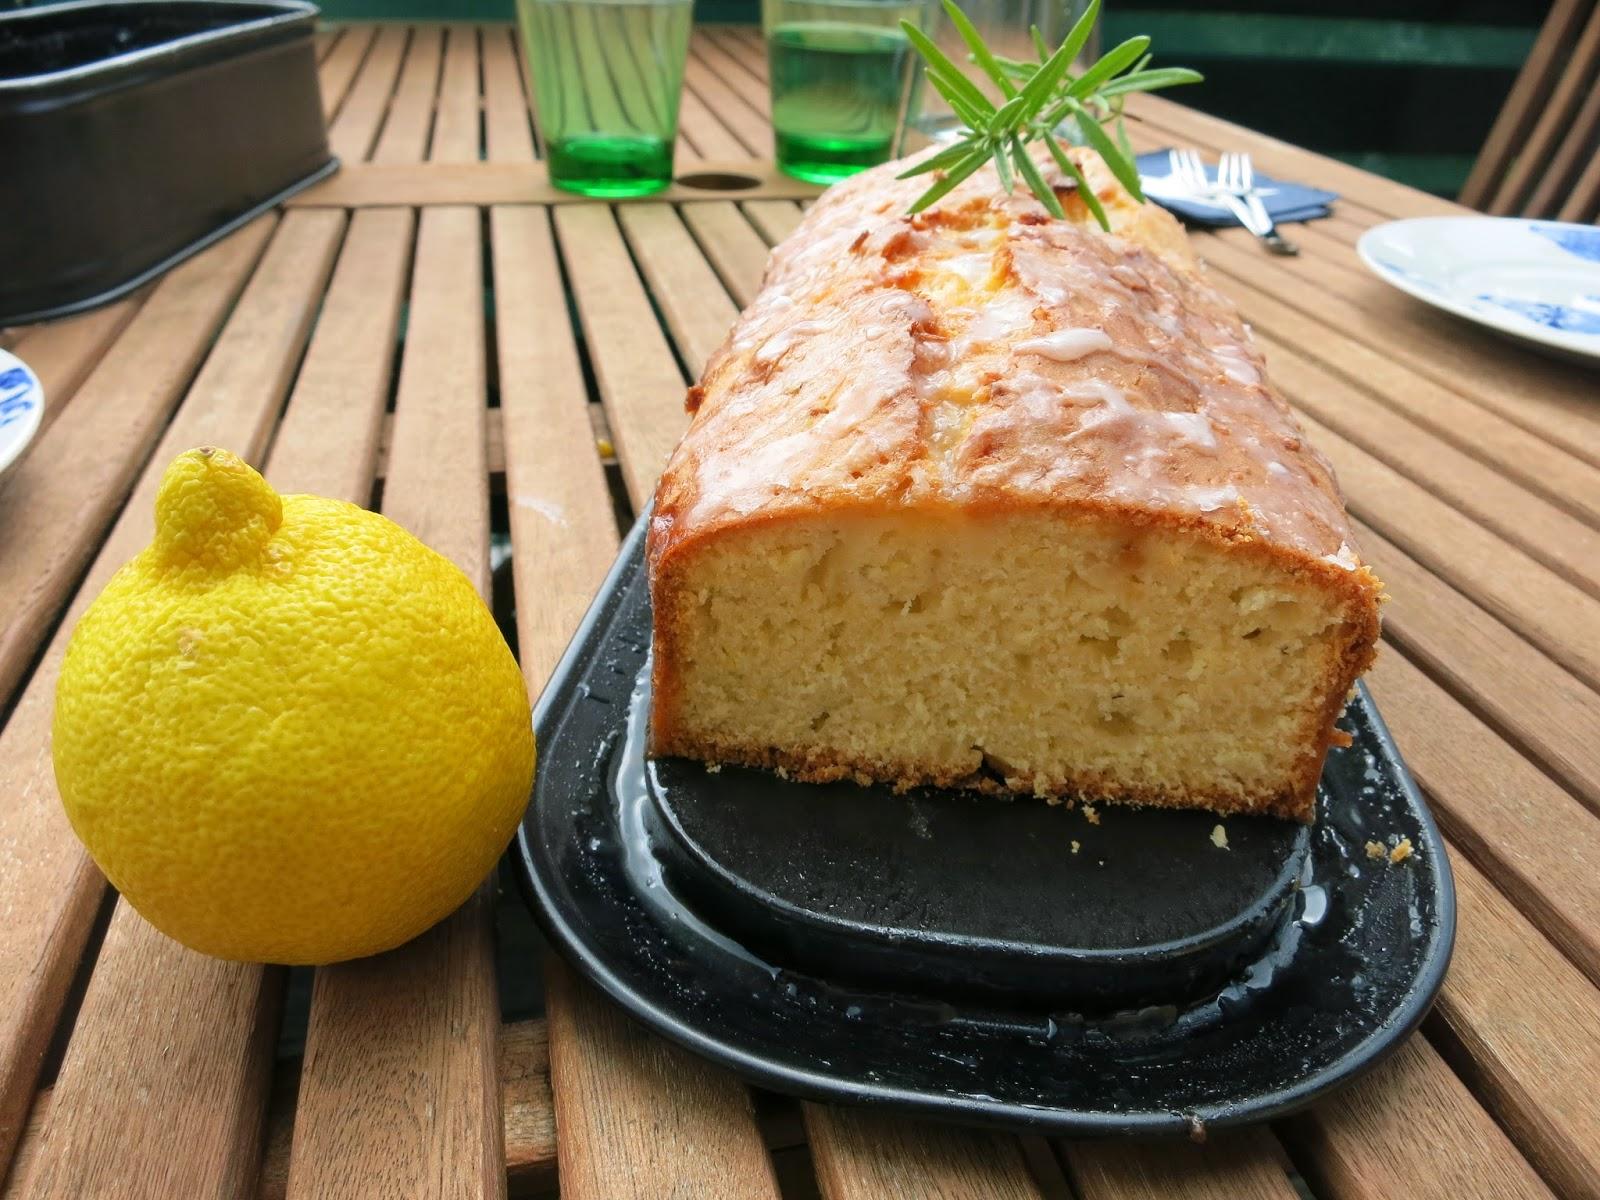 Isa Probiert Zitronen Ingwer Rosmarin Kuchen